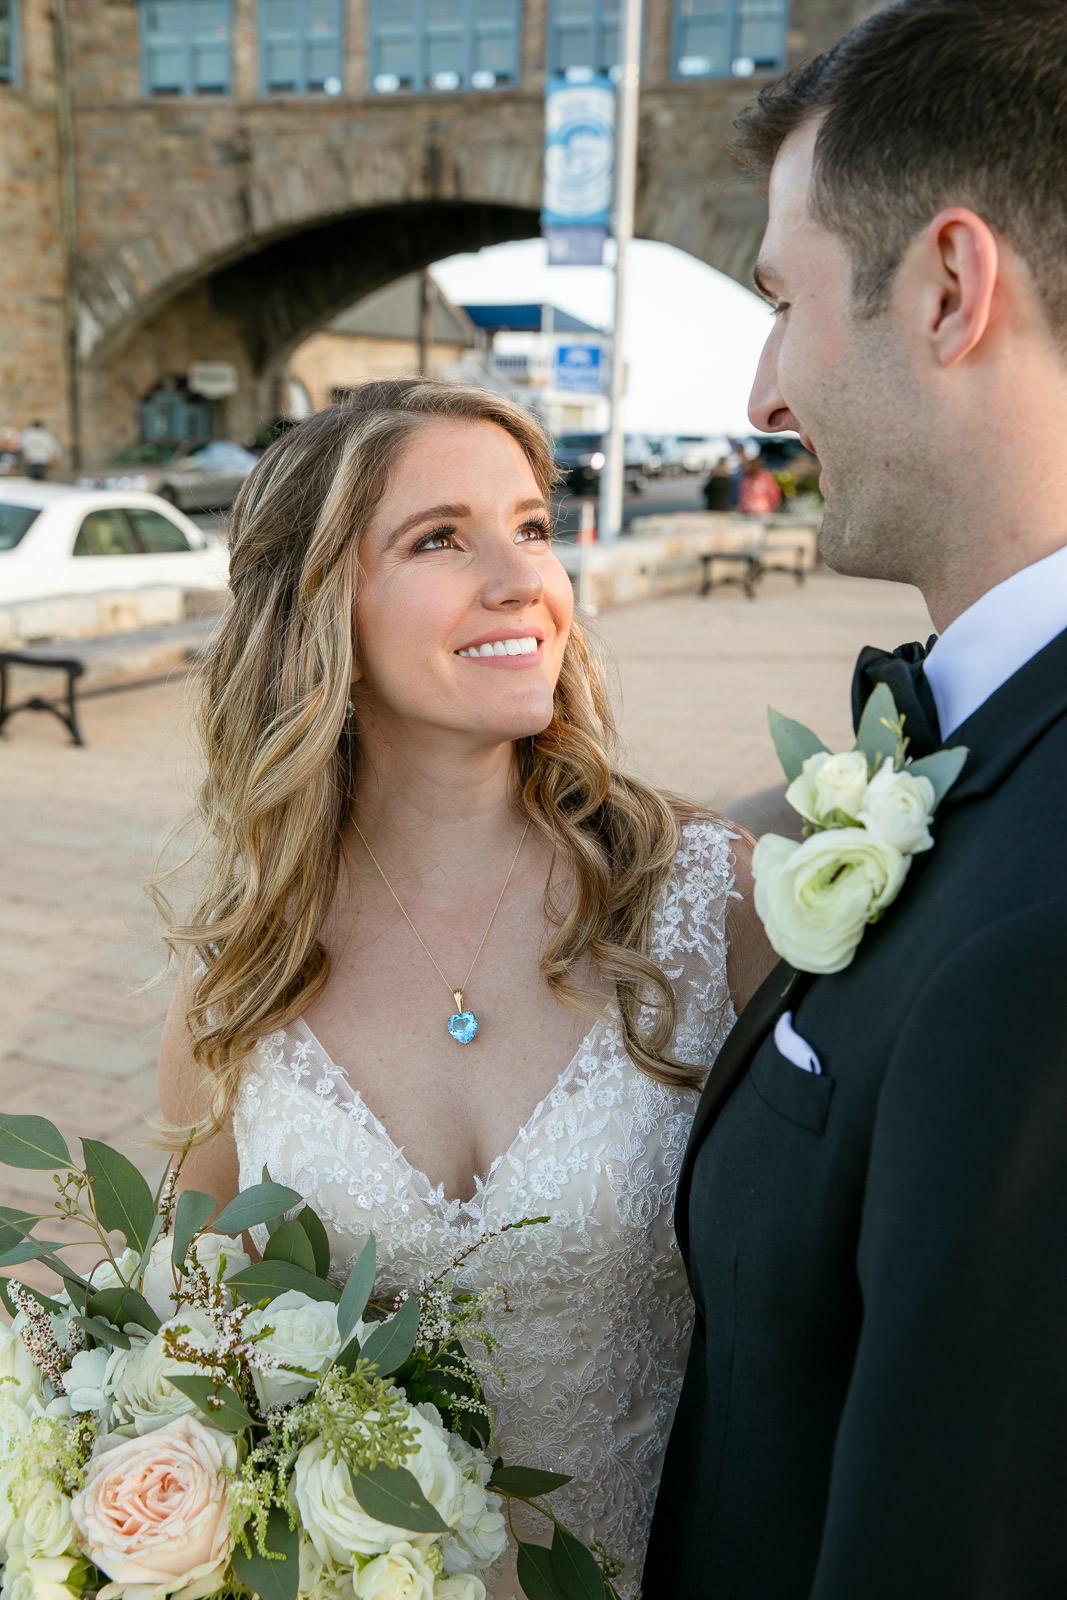 Wedding, Narragansett Towers, The Towers, Narragansett, Rhode Island, RI, Tracy Jenkins photography, RI wedding photographer, Rhode Island wedding photographer, couple photos, bride